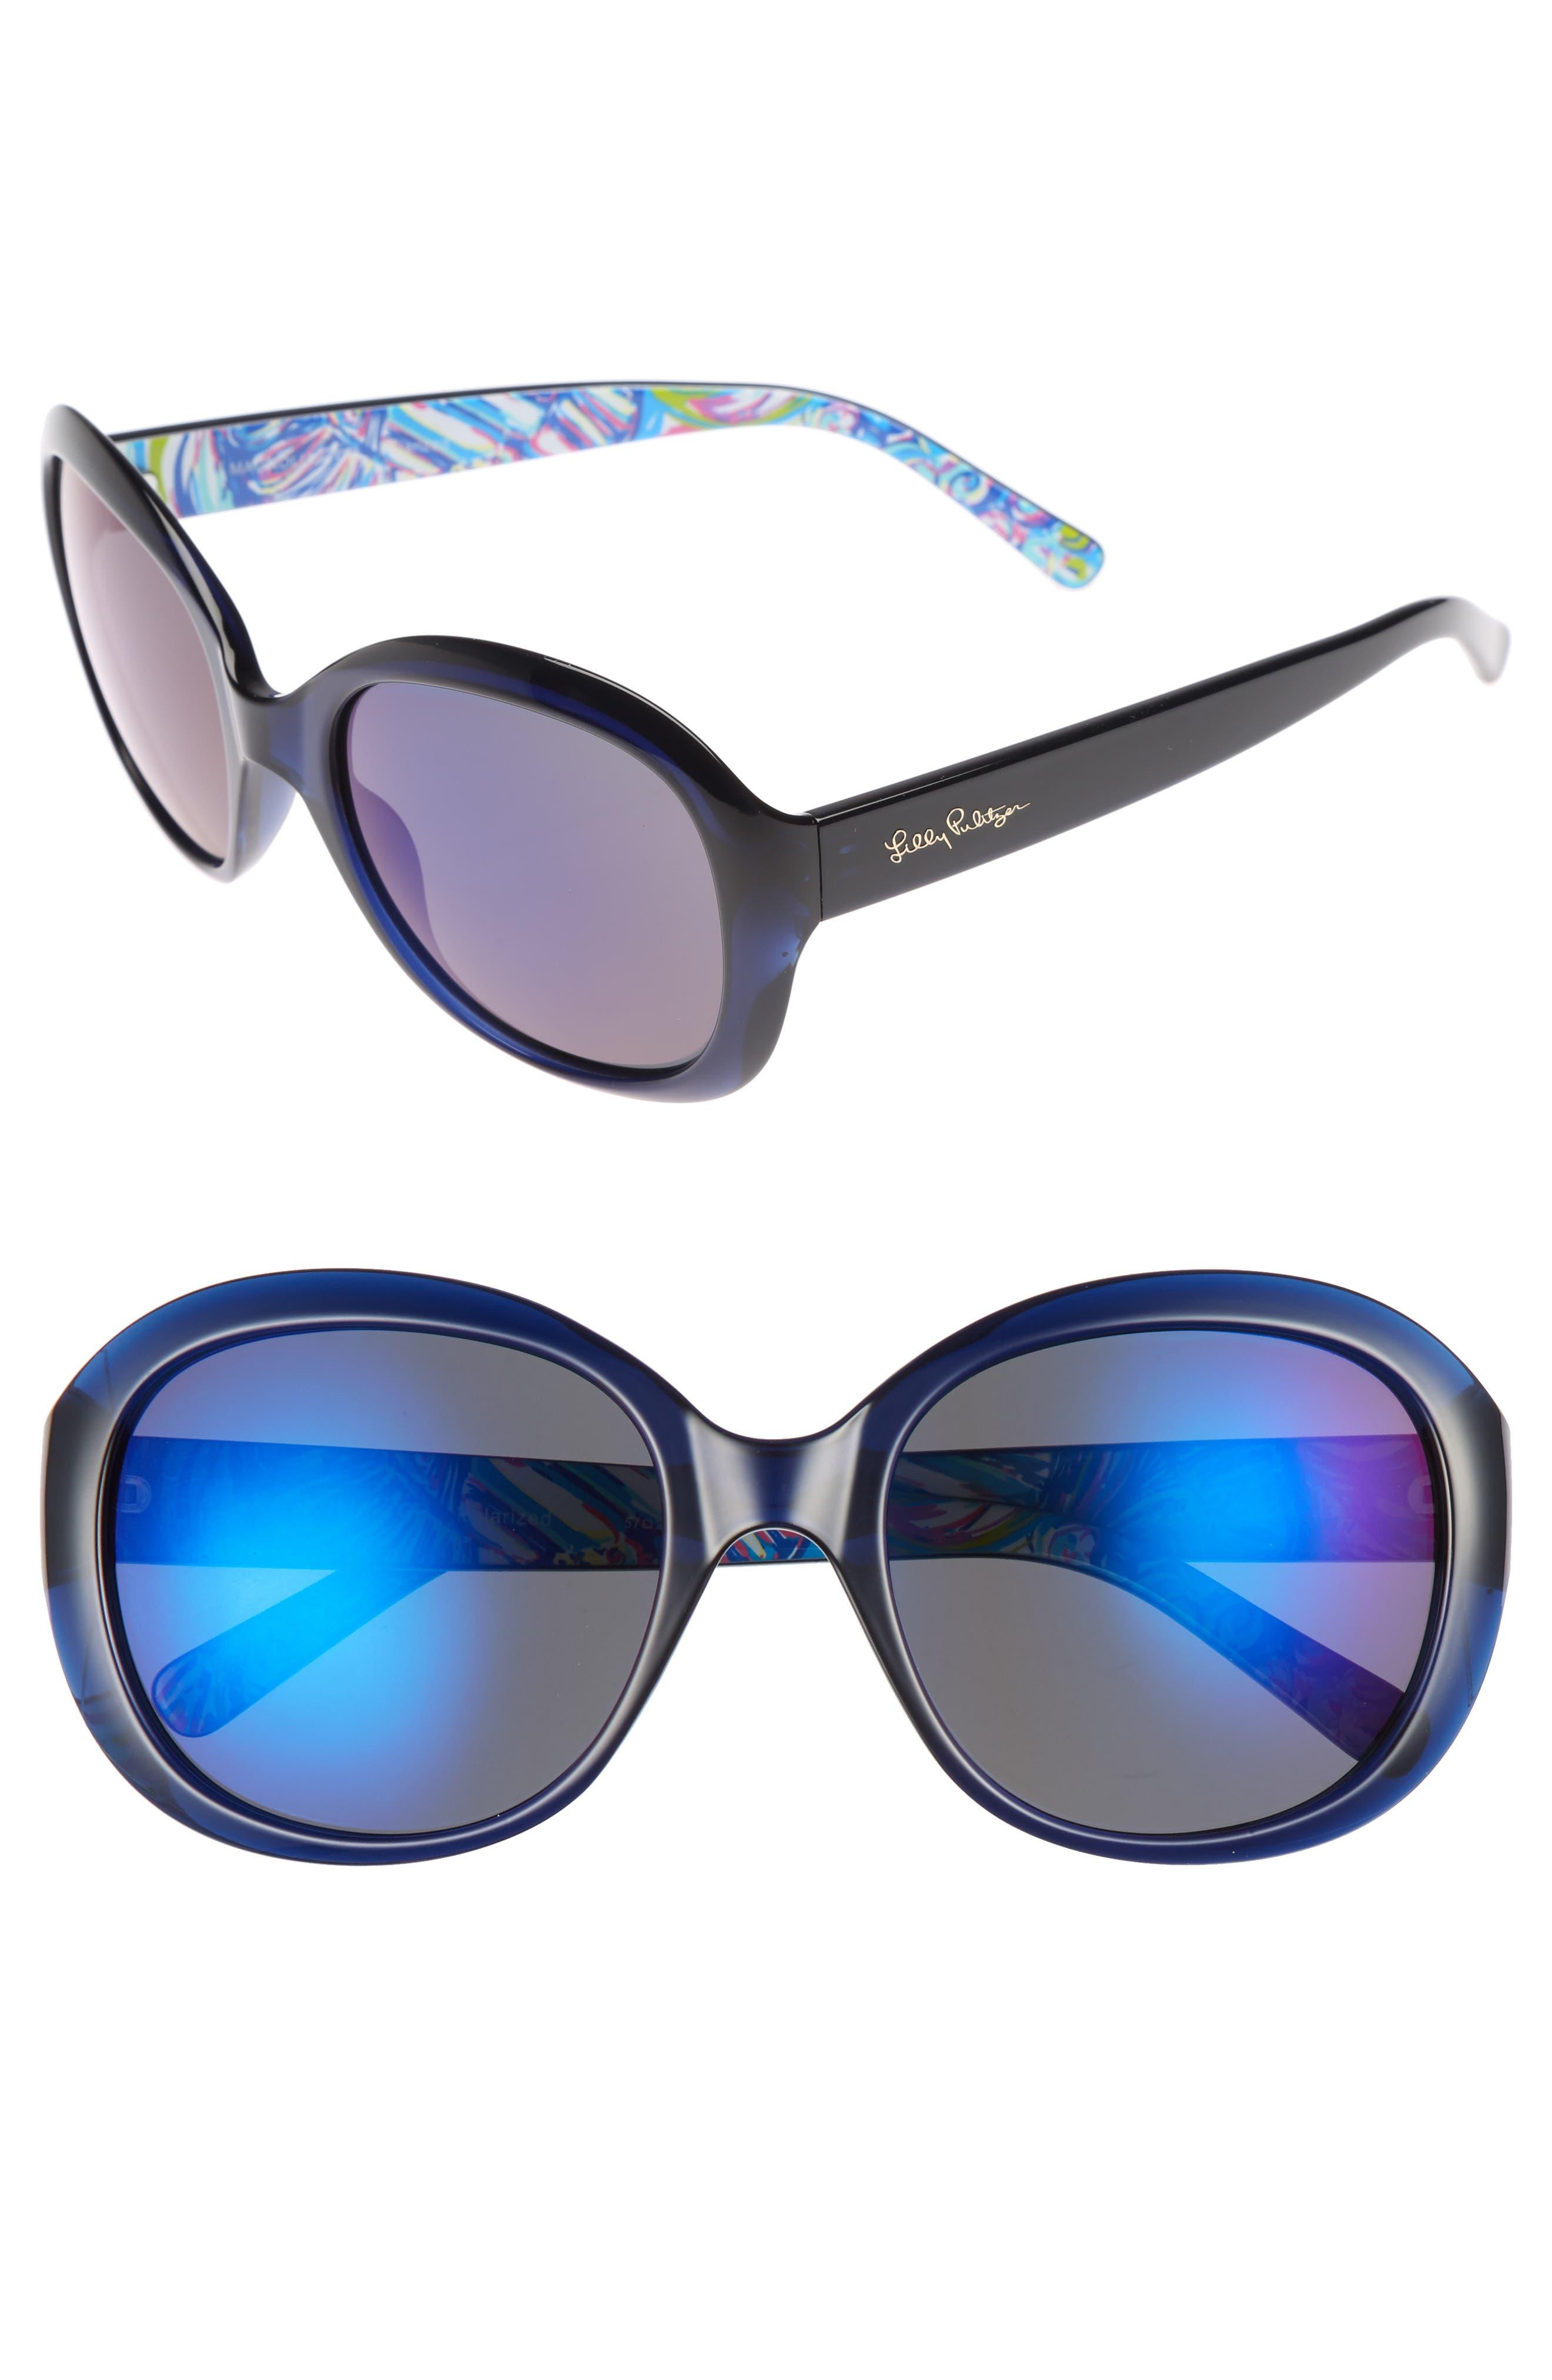 Main Image - Lilly Pulitzer® Magnolia 57mm Polarized Round Sunglasses